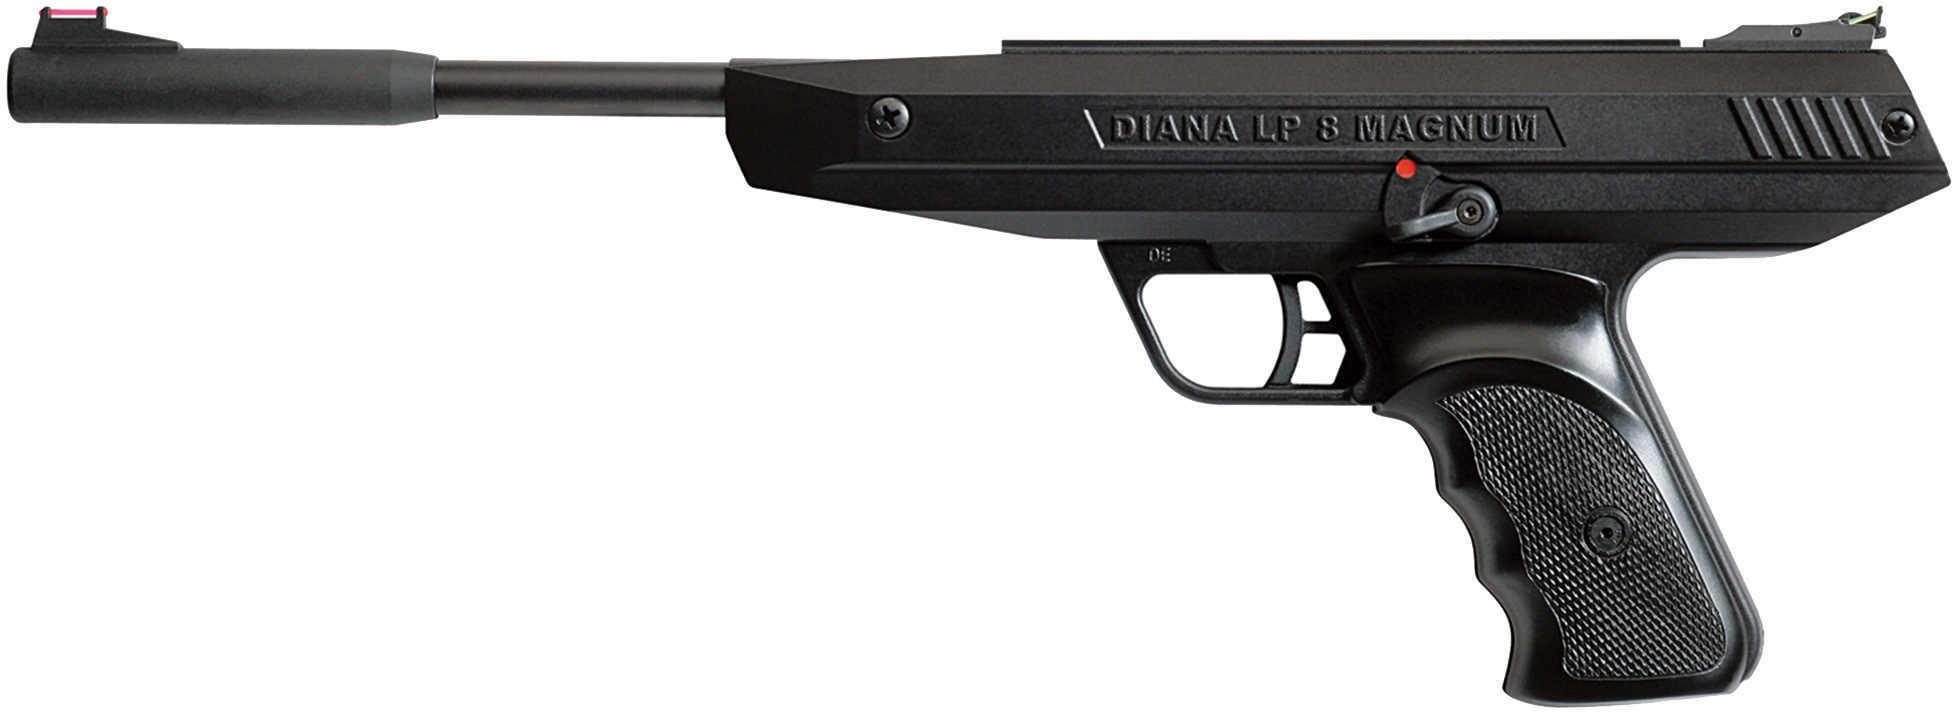 Umarex USA RWS - Model Lp8 .177 Pellet Md: 216-6930